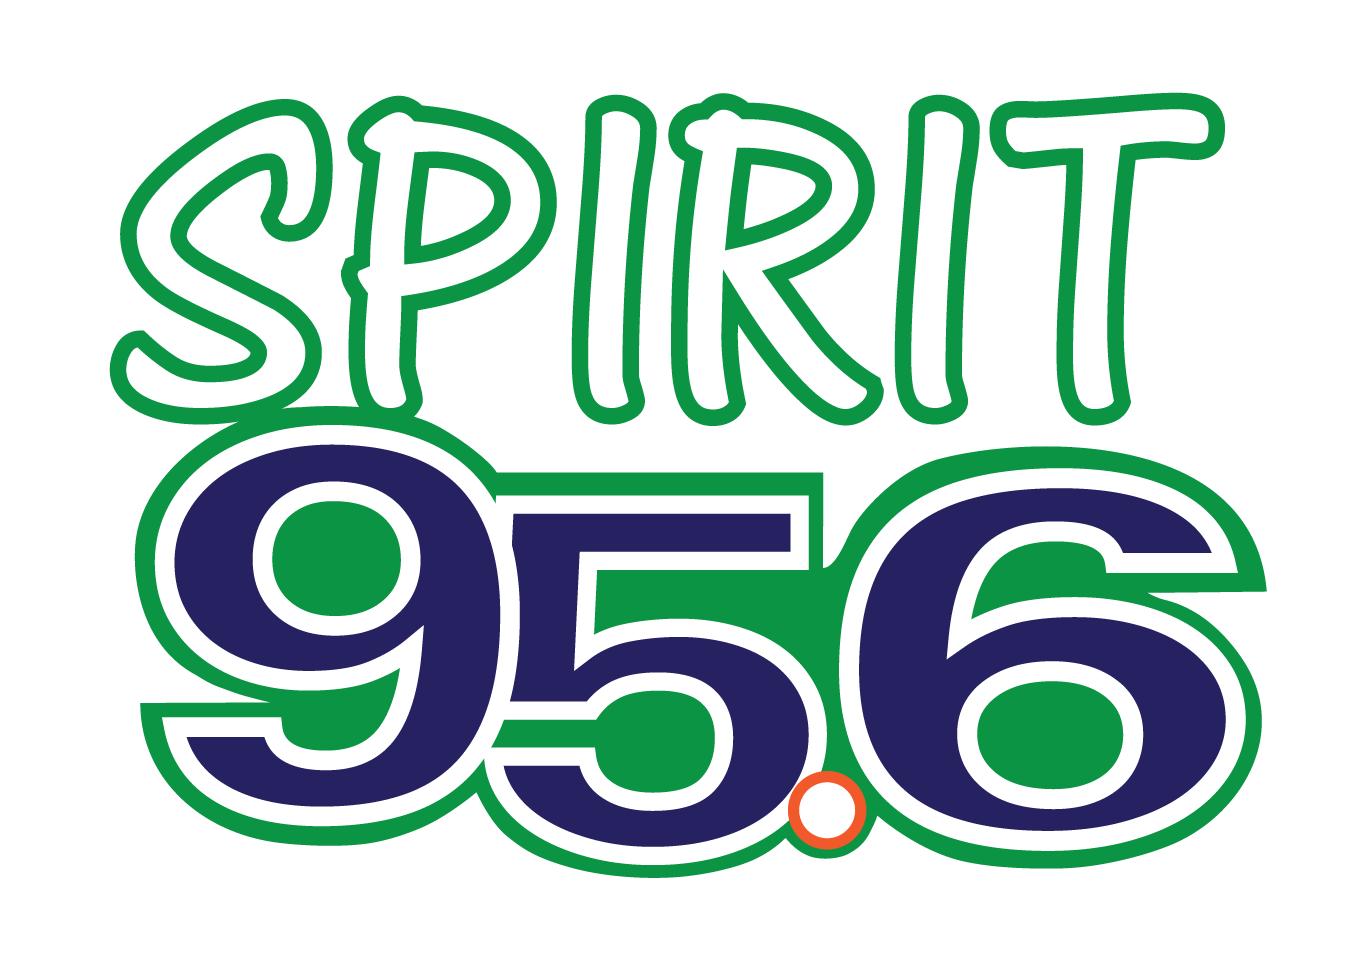 Spirit 95.6 FM